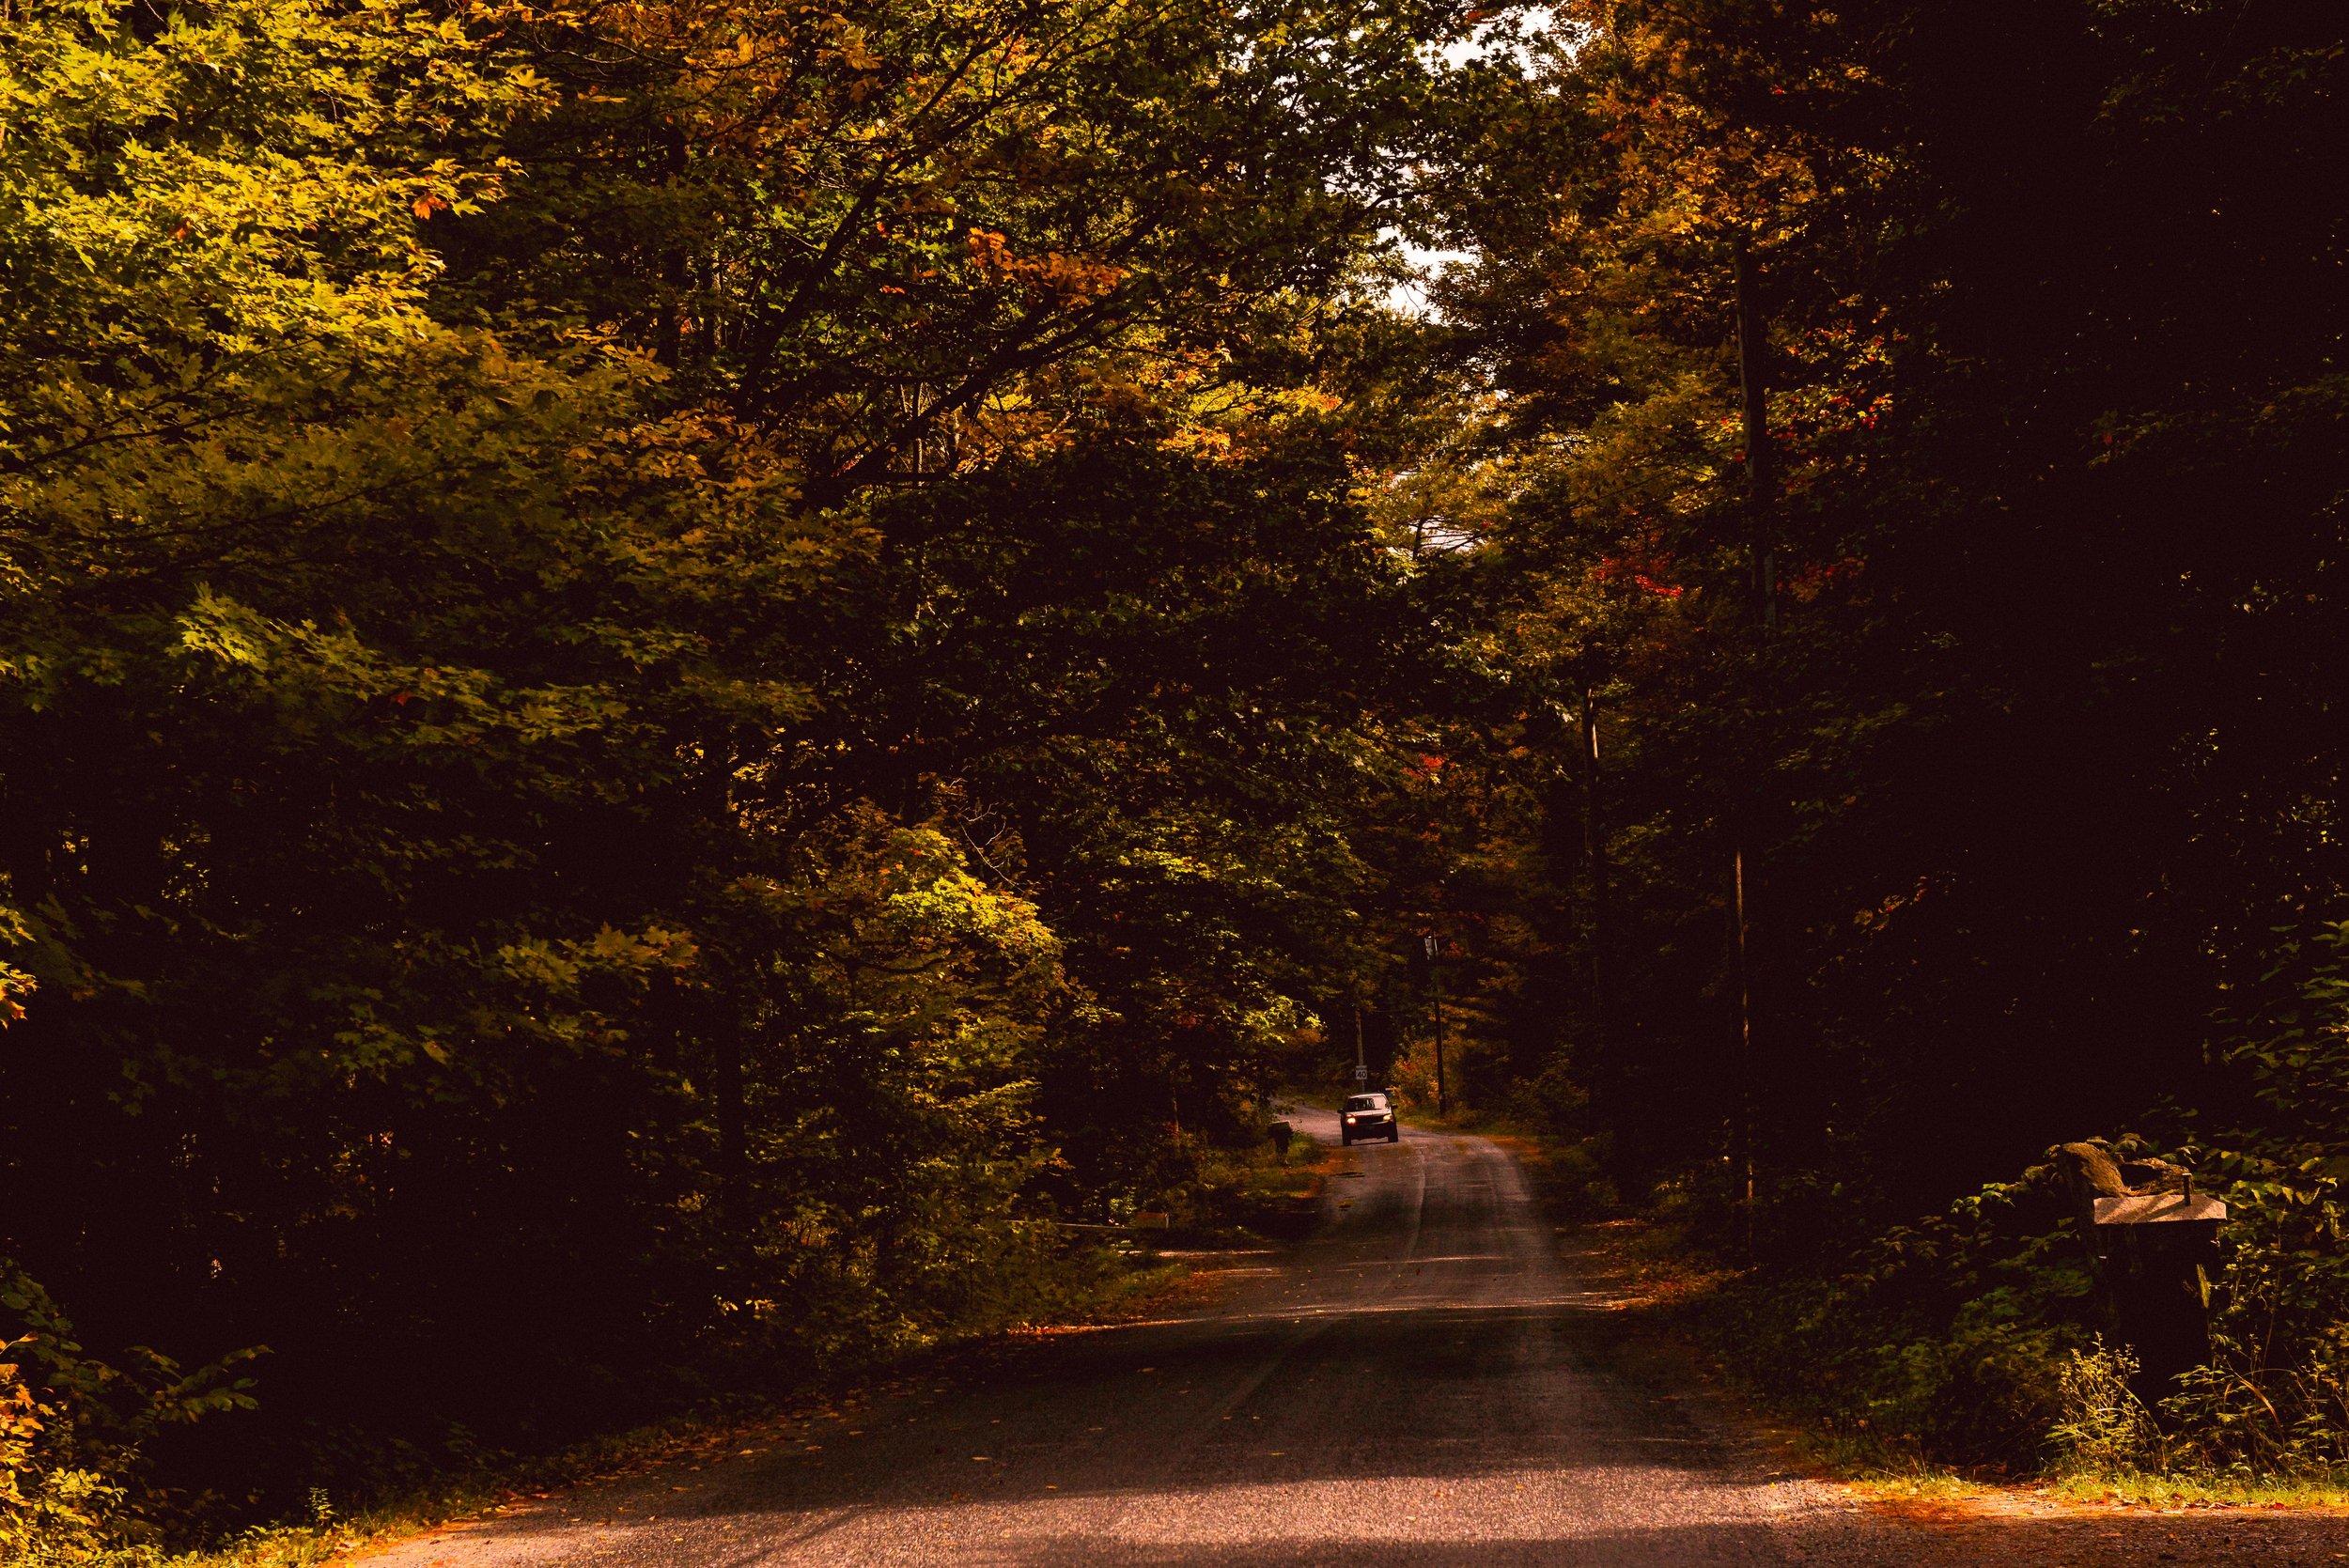 ryan thompson creative photography - country road 2